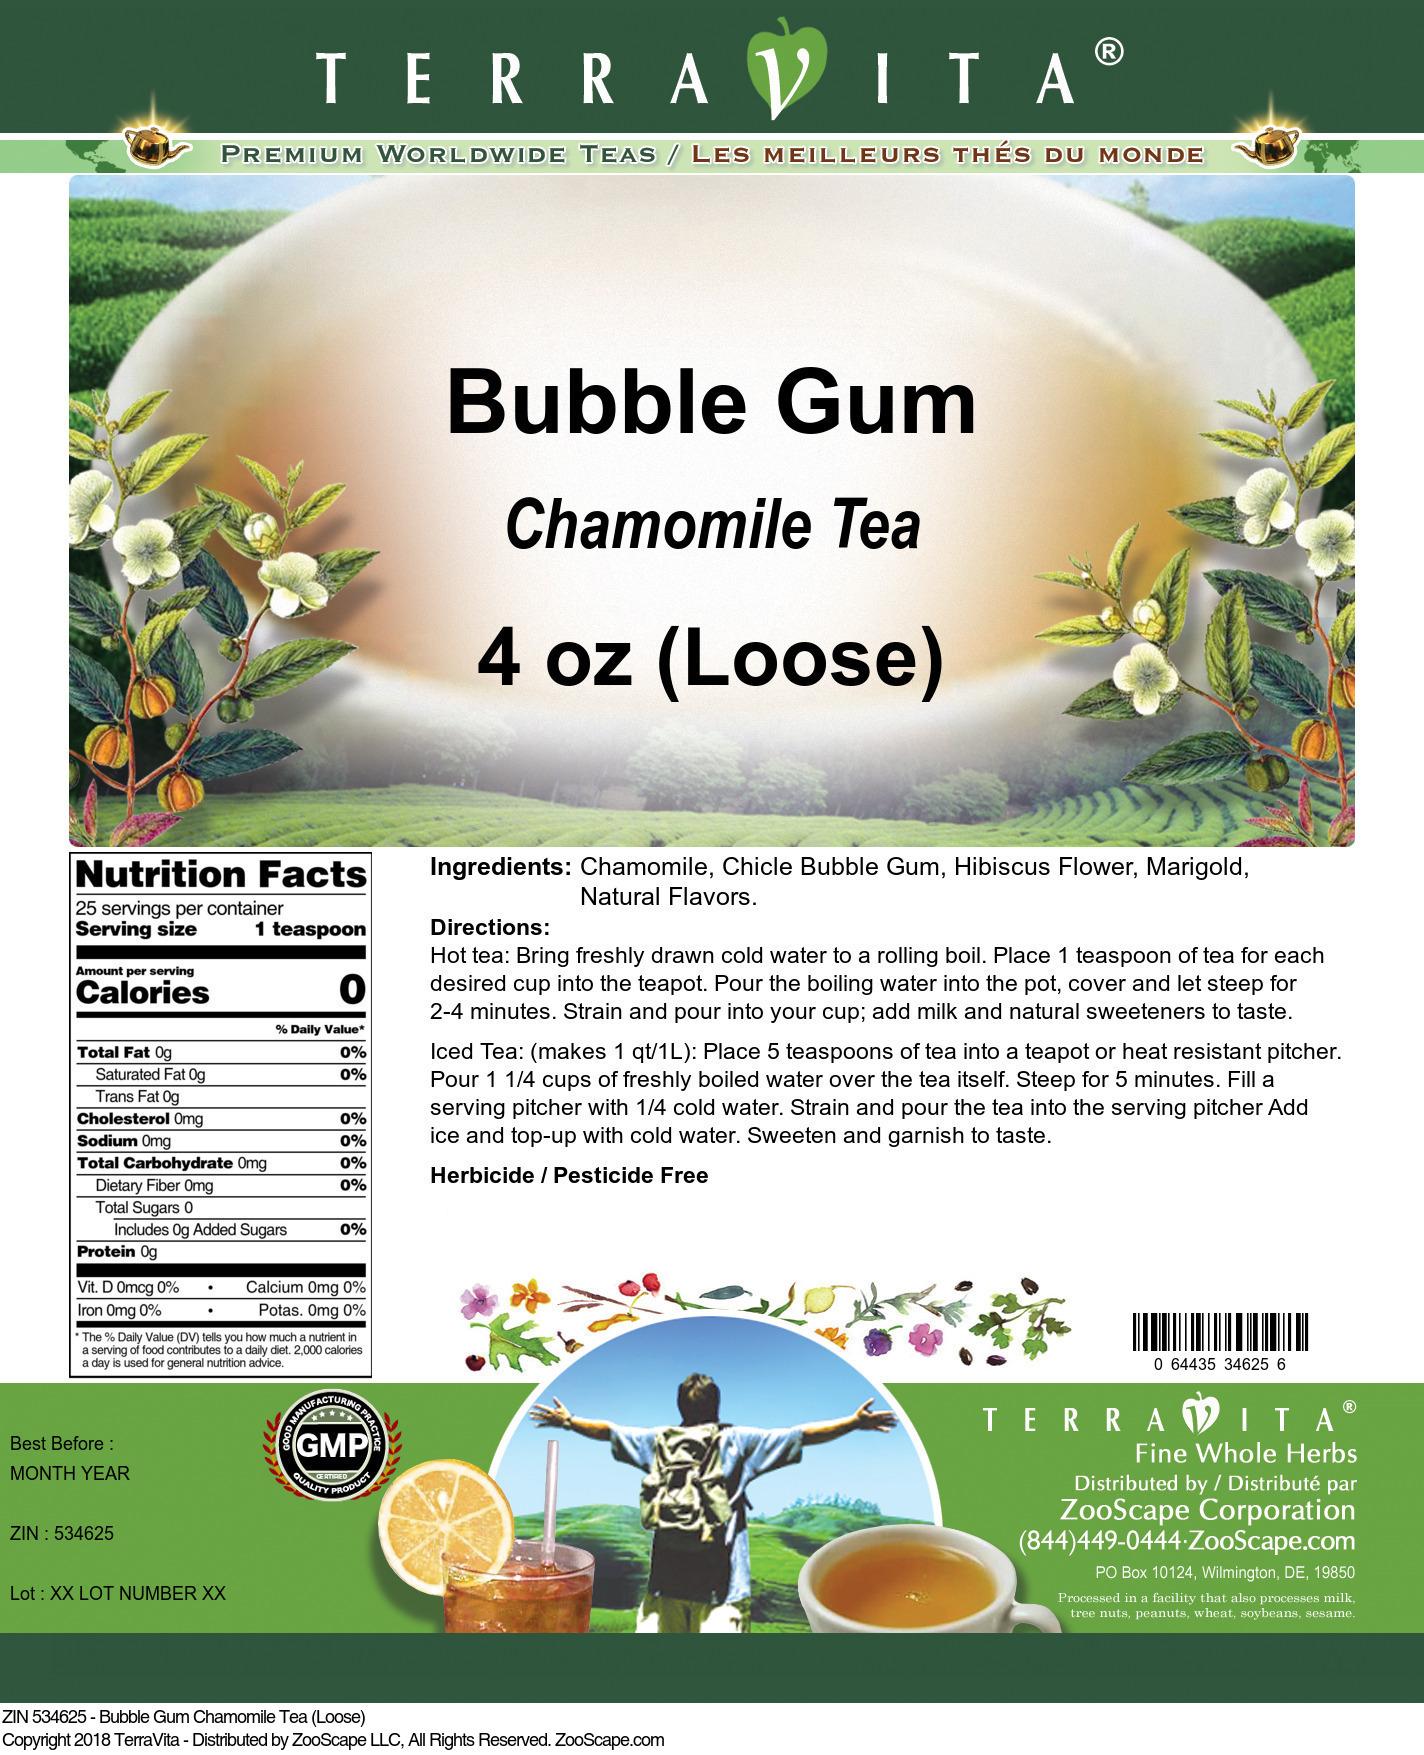 Bubble Gum Chamomile Tea